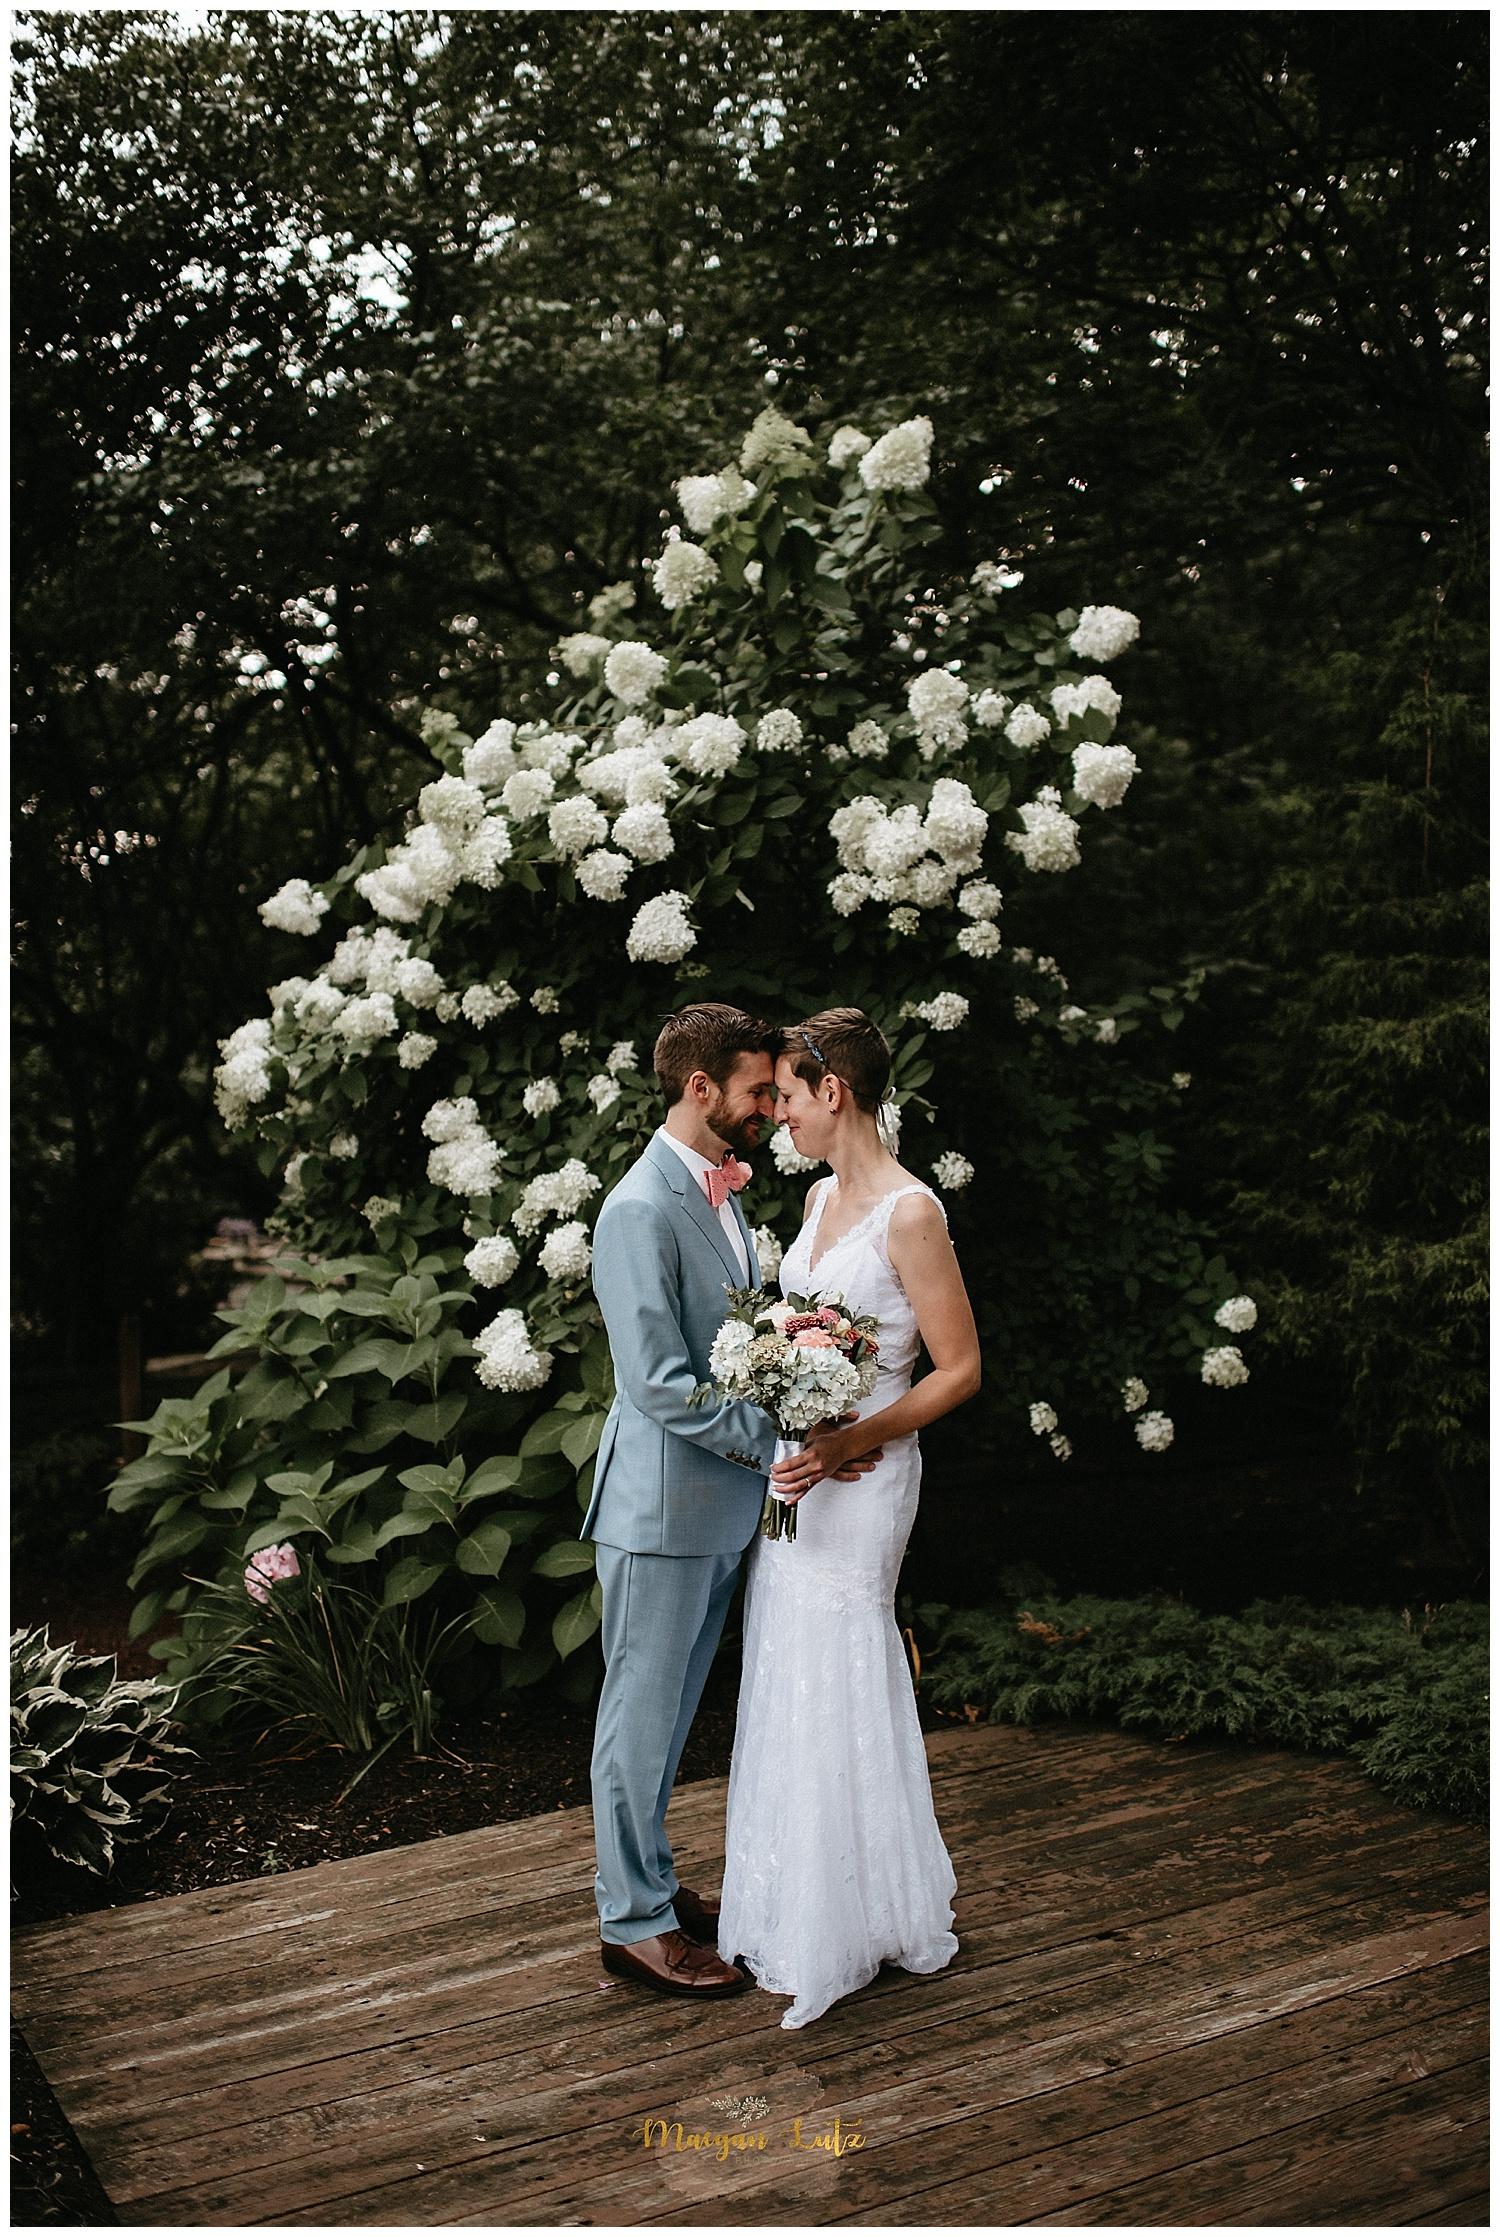 NEPA-Wedding-Photographer-at-Carmens-Country-Inn-and-Gardens-Drums-PA_0020.jpg